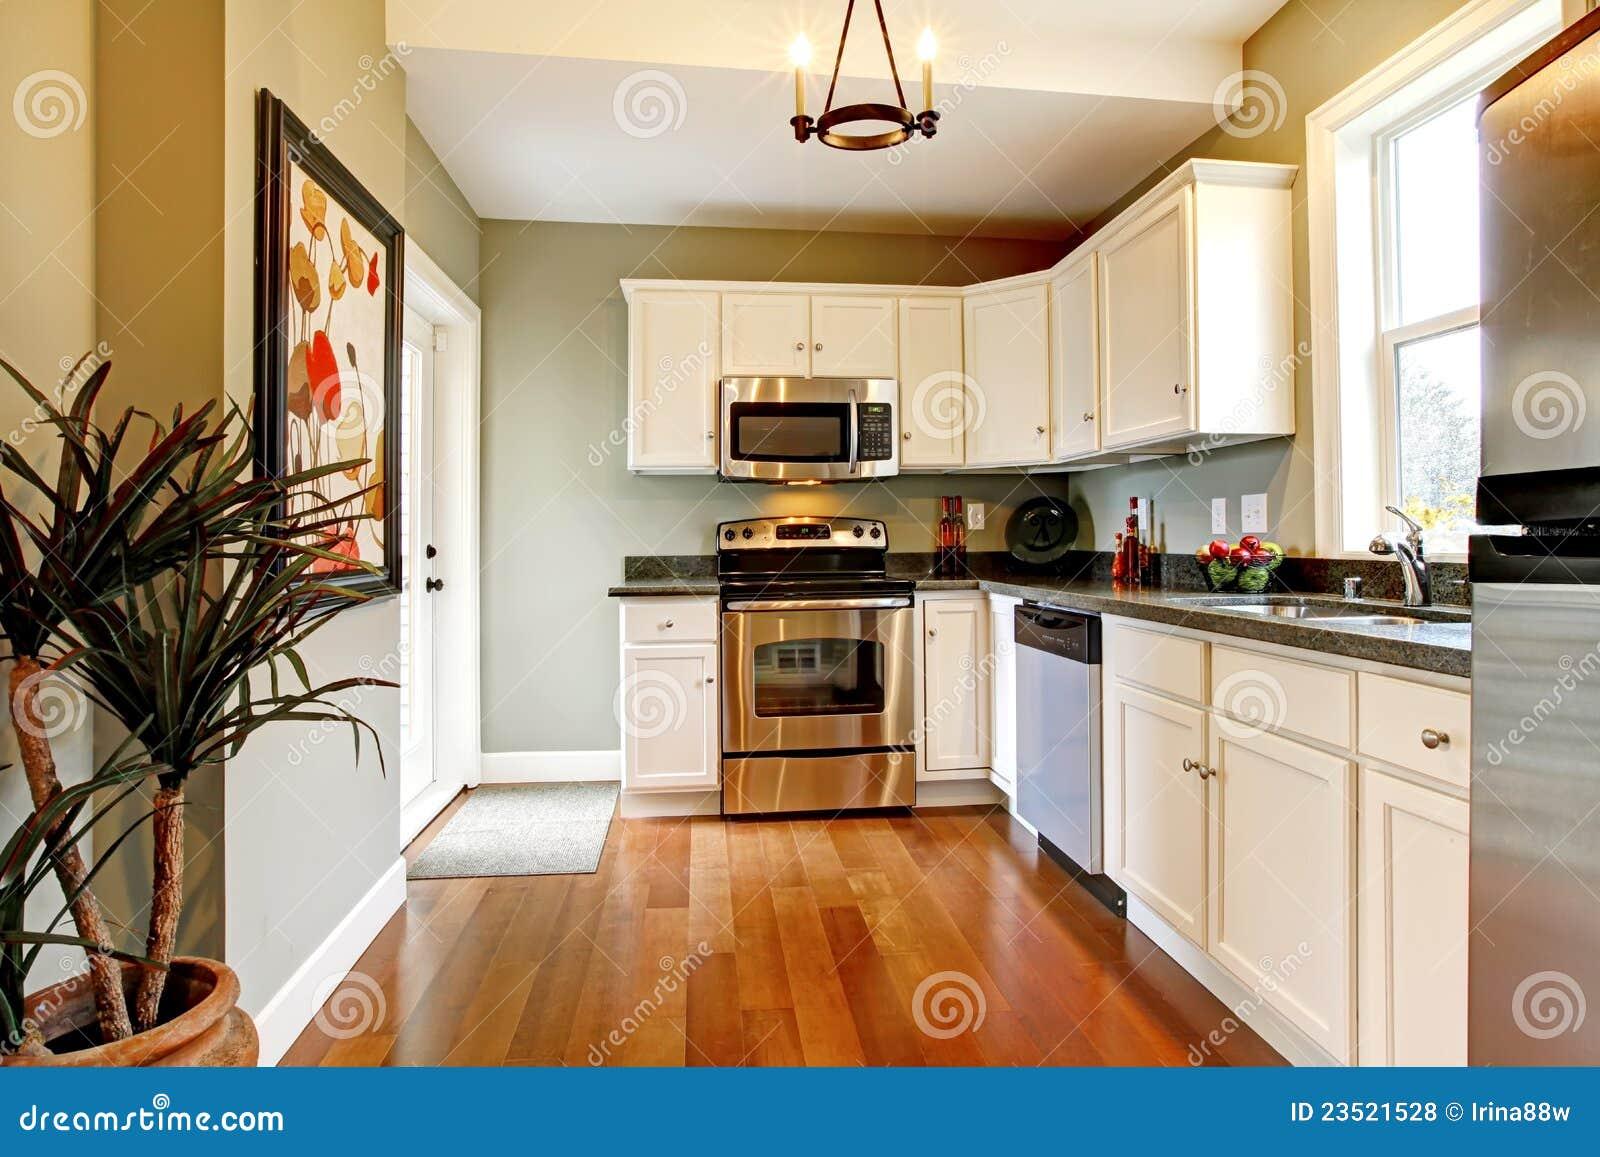 Woonkamer deco natuur - Groene en witte keuken ...